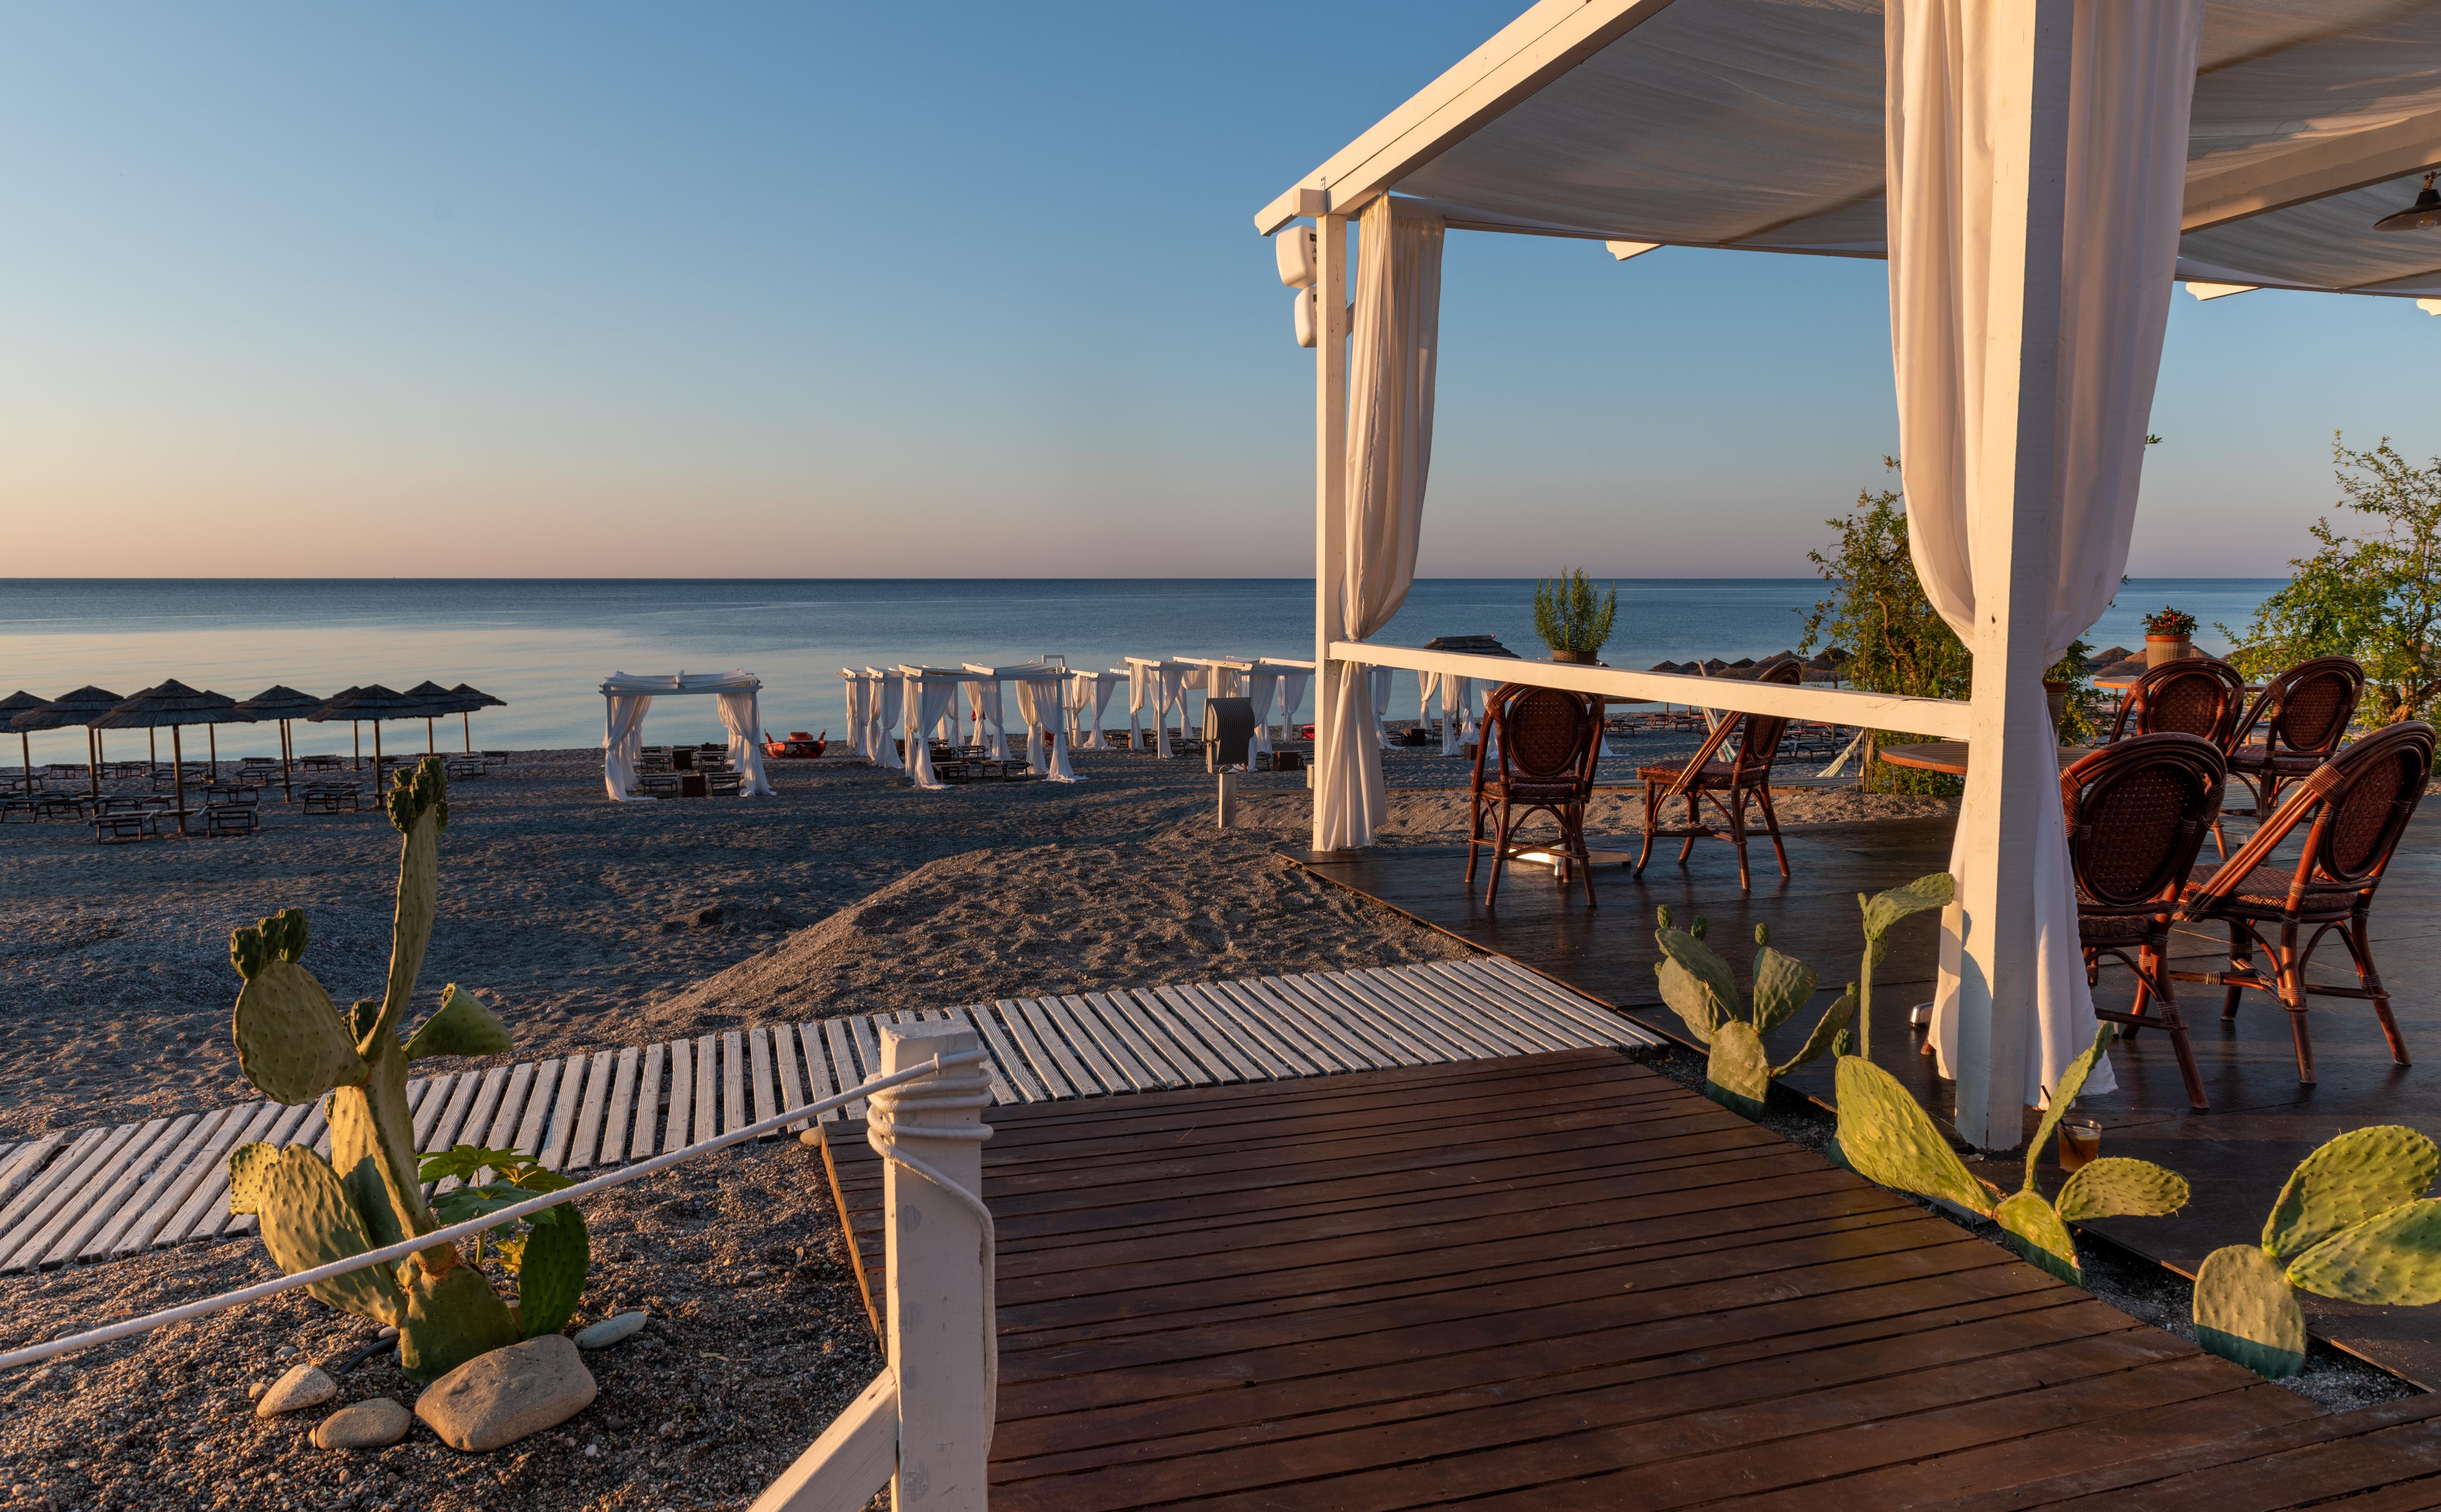 Lido Syrah Relax Beach